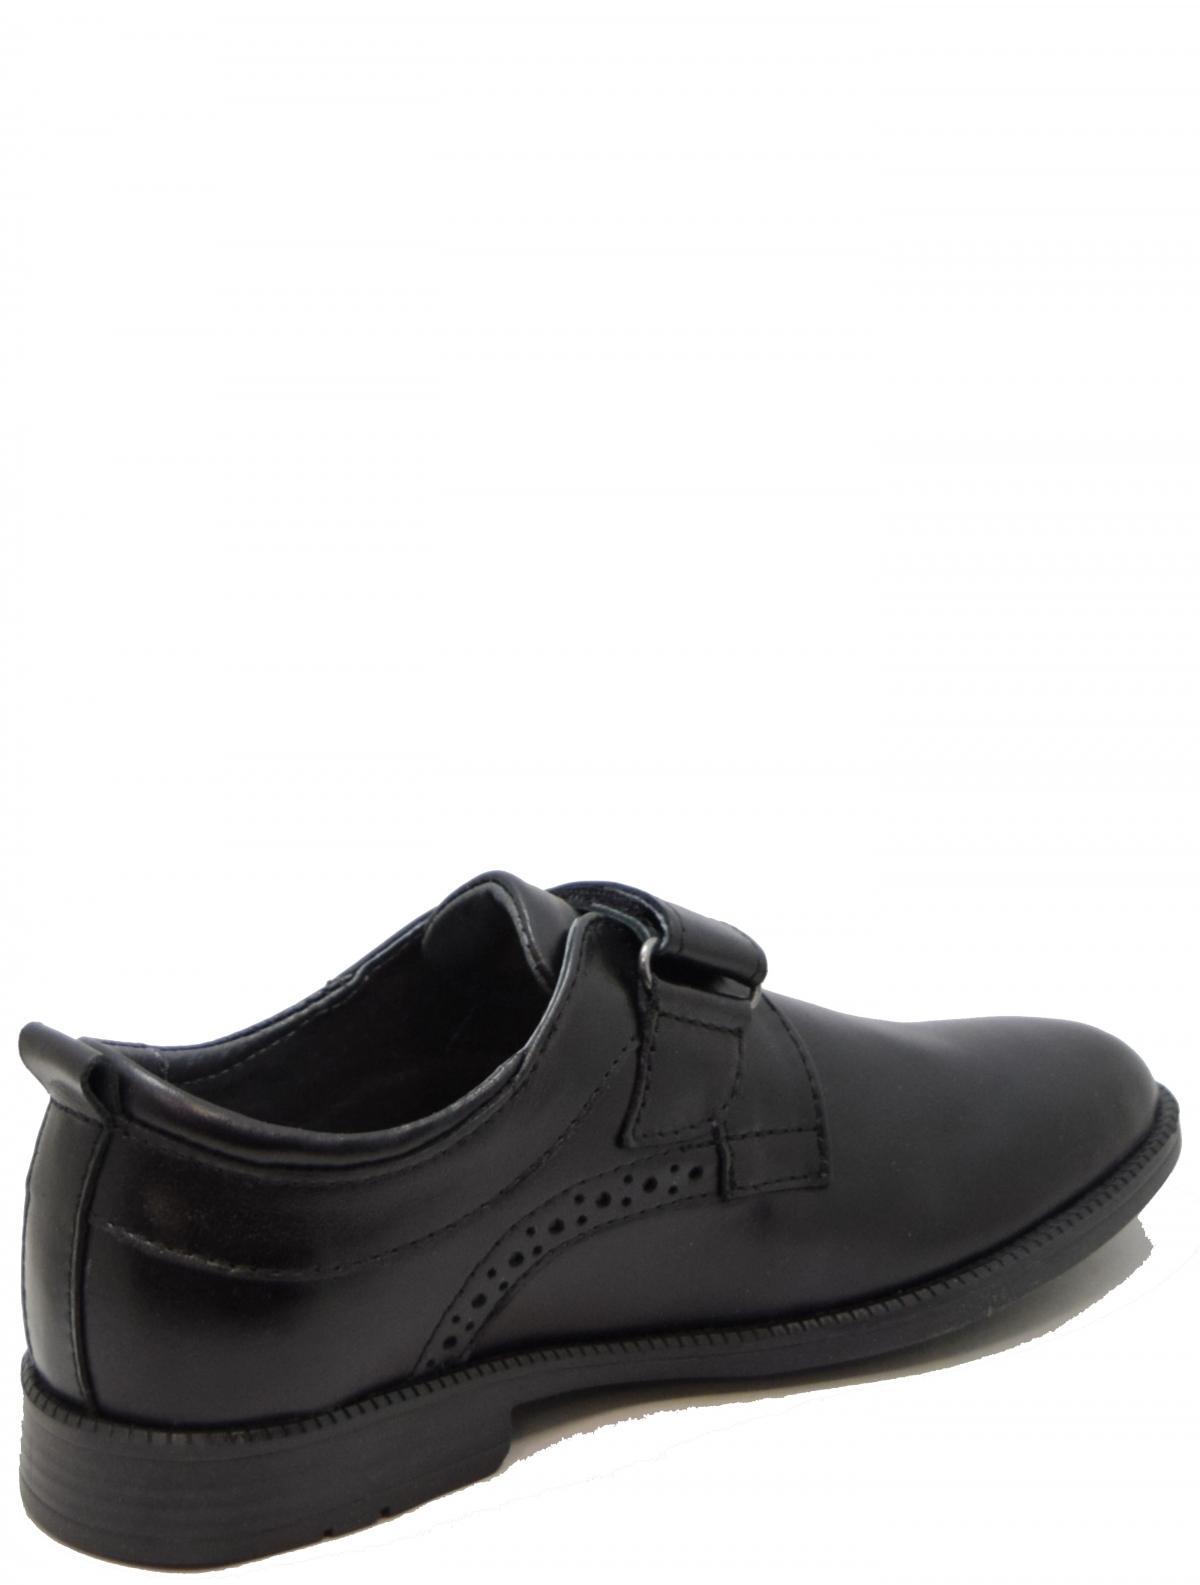 NewGen R1224/0 туфли для мальчика